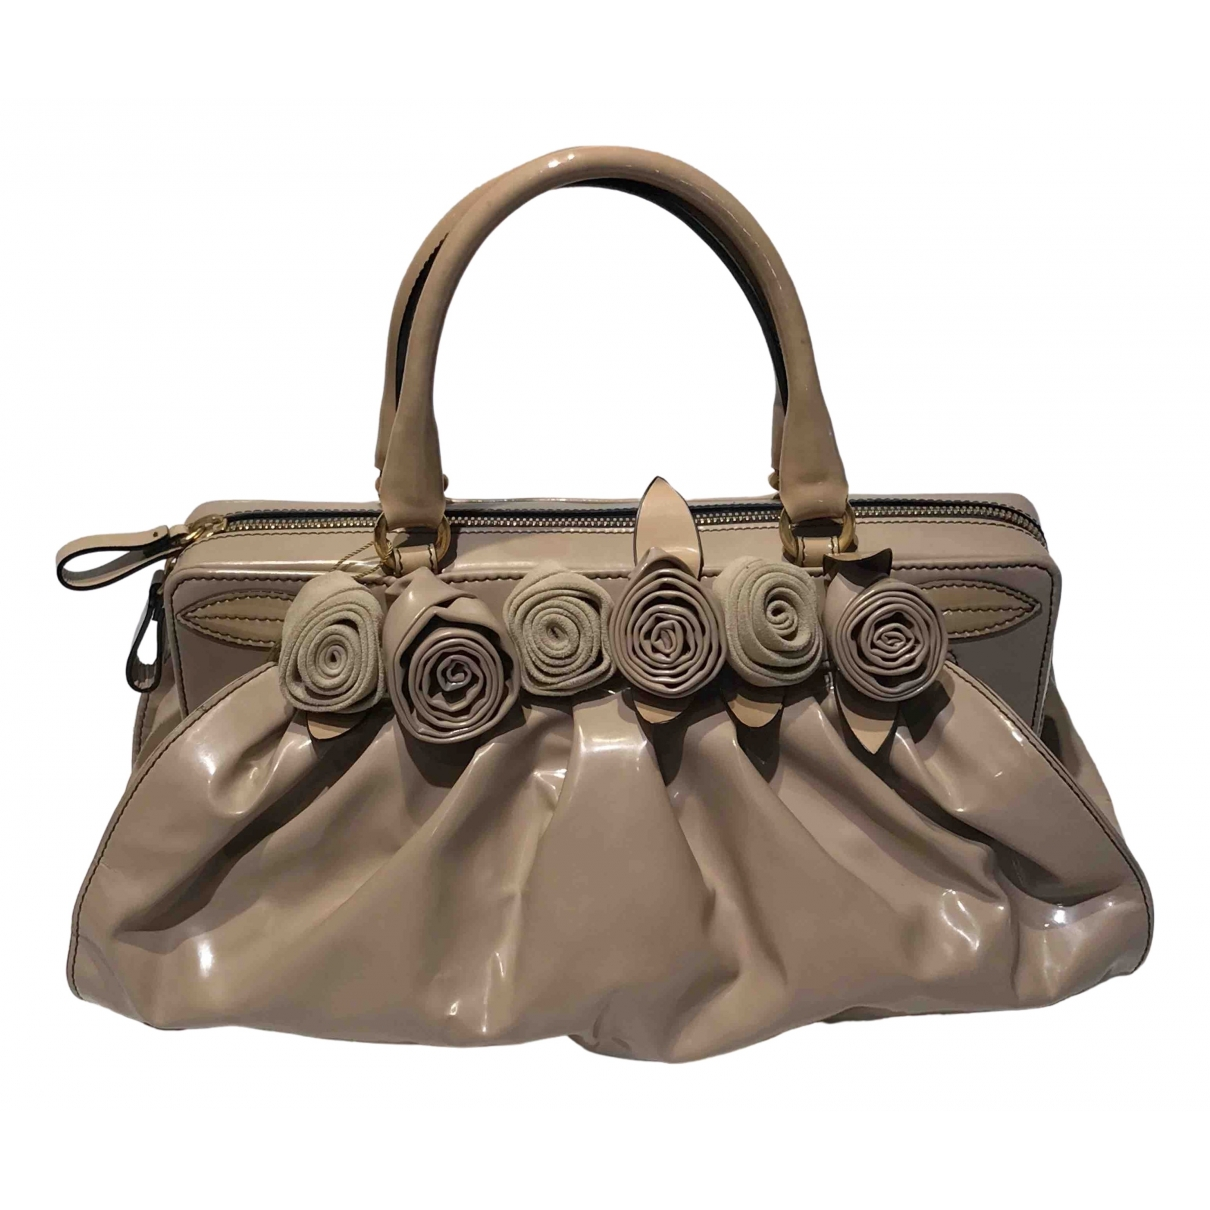 Valentino Garavani \N Beige Patent leather handbag for Women \N